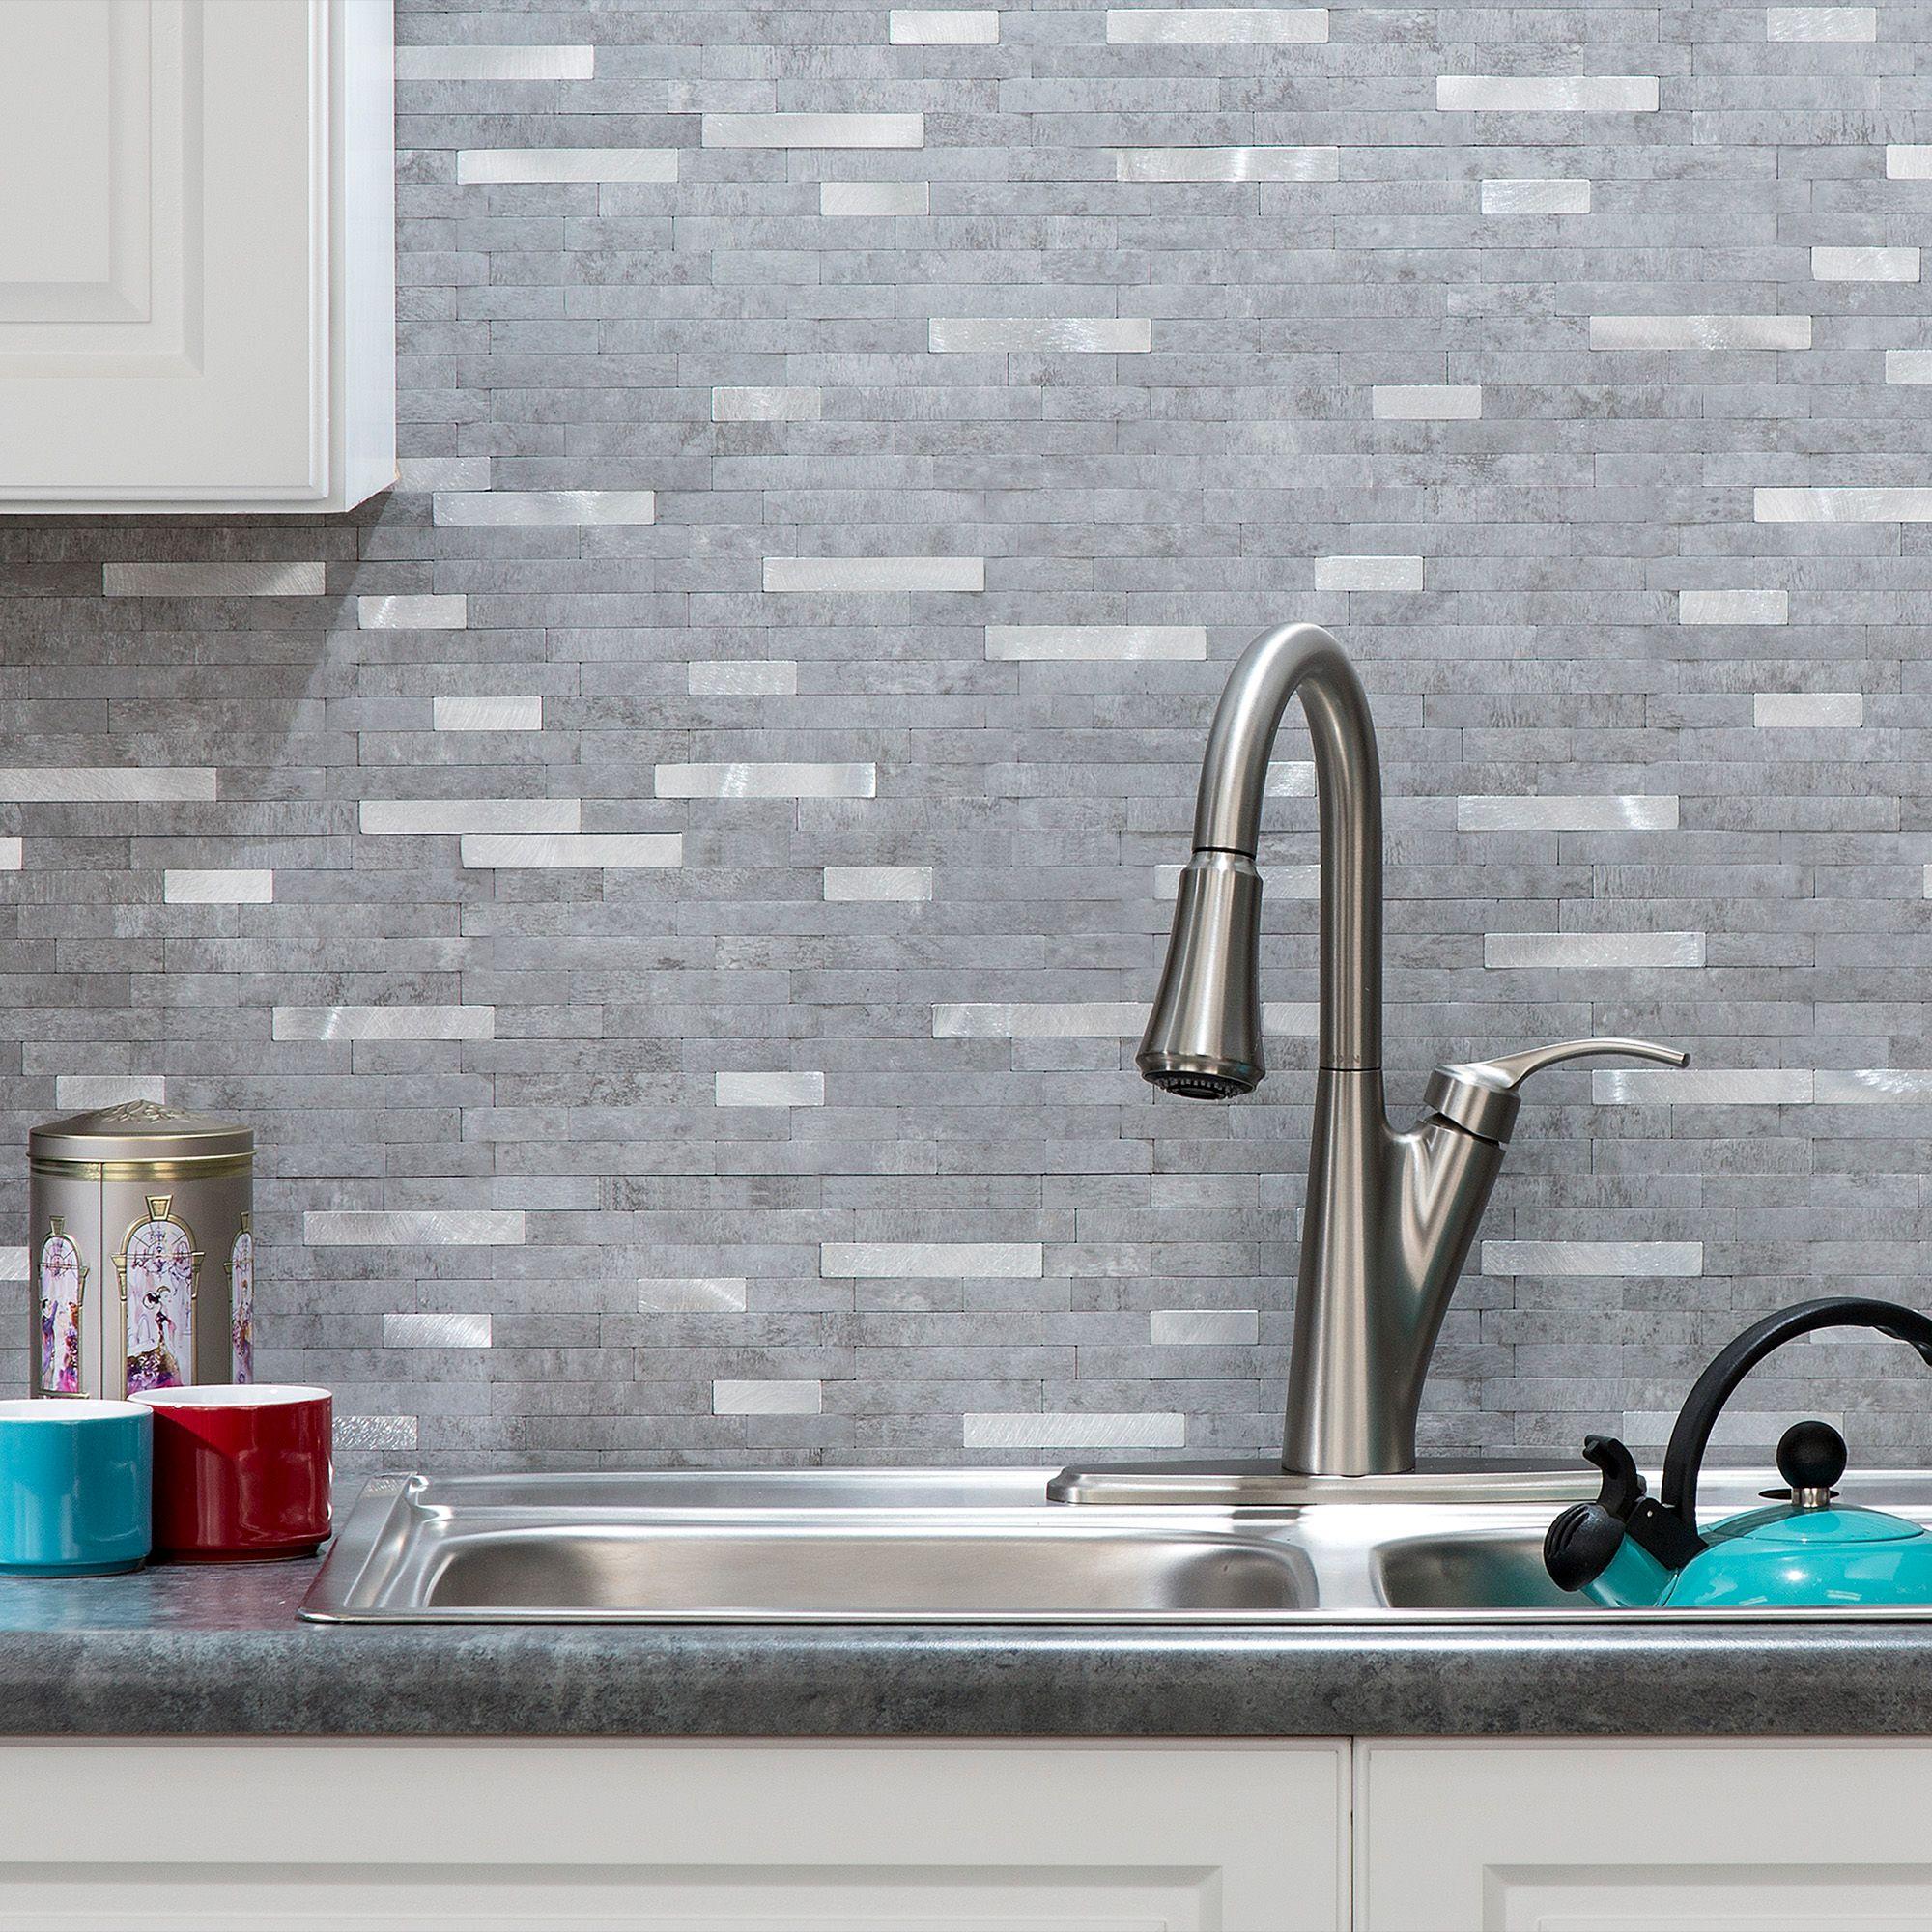 Aspect Peel & Stick Collage Tiles